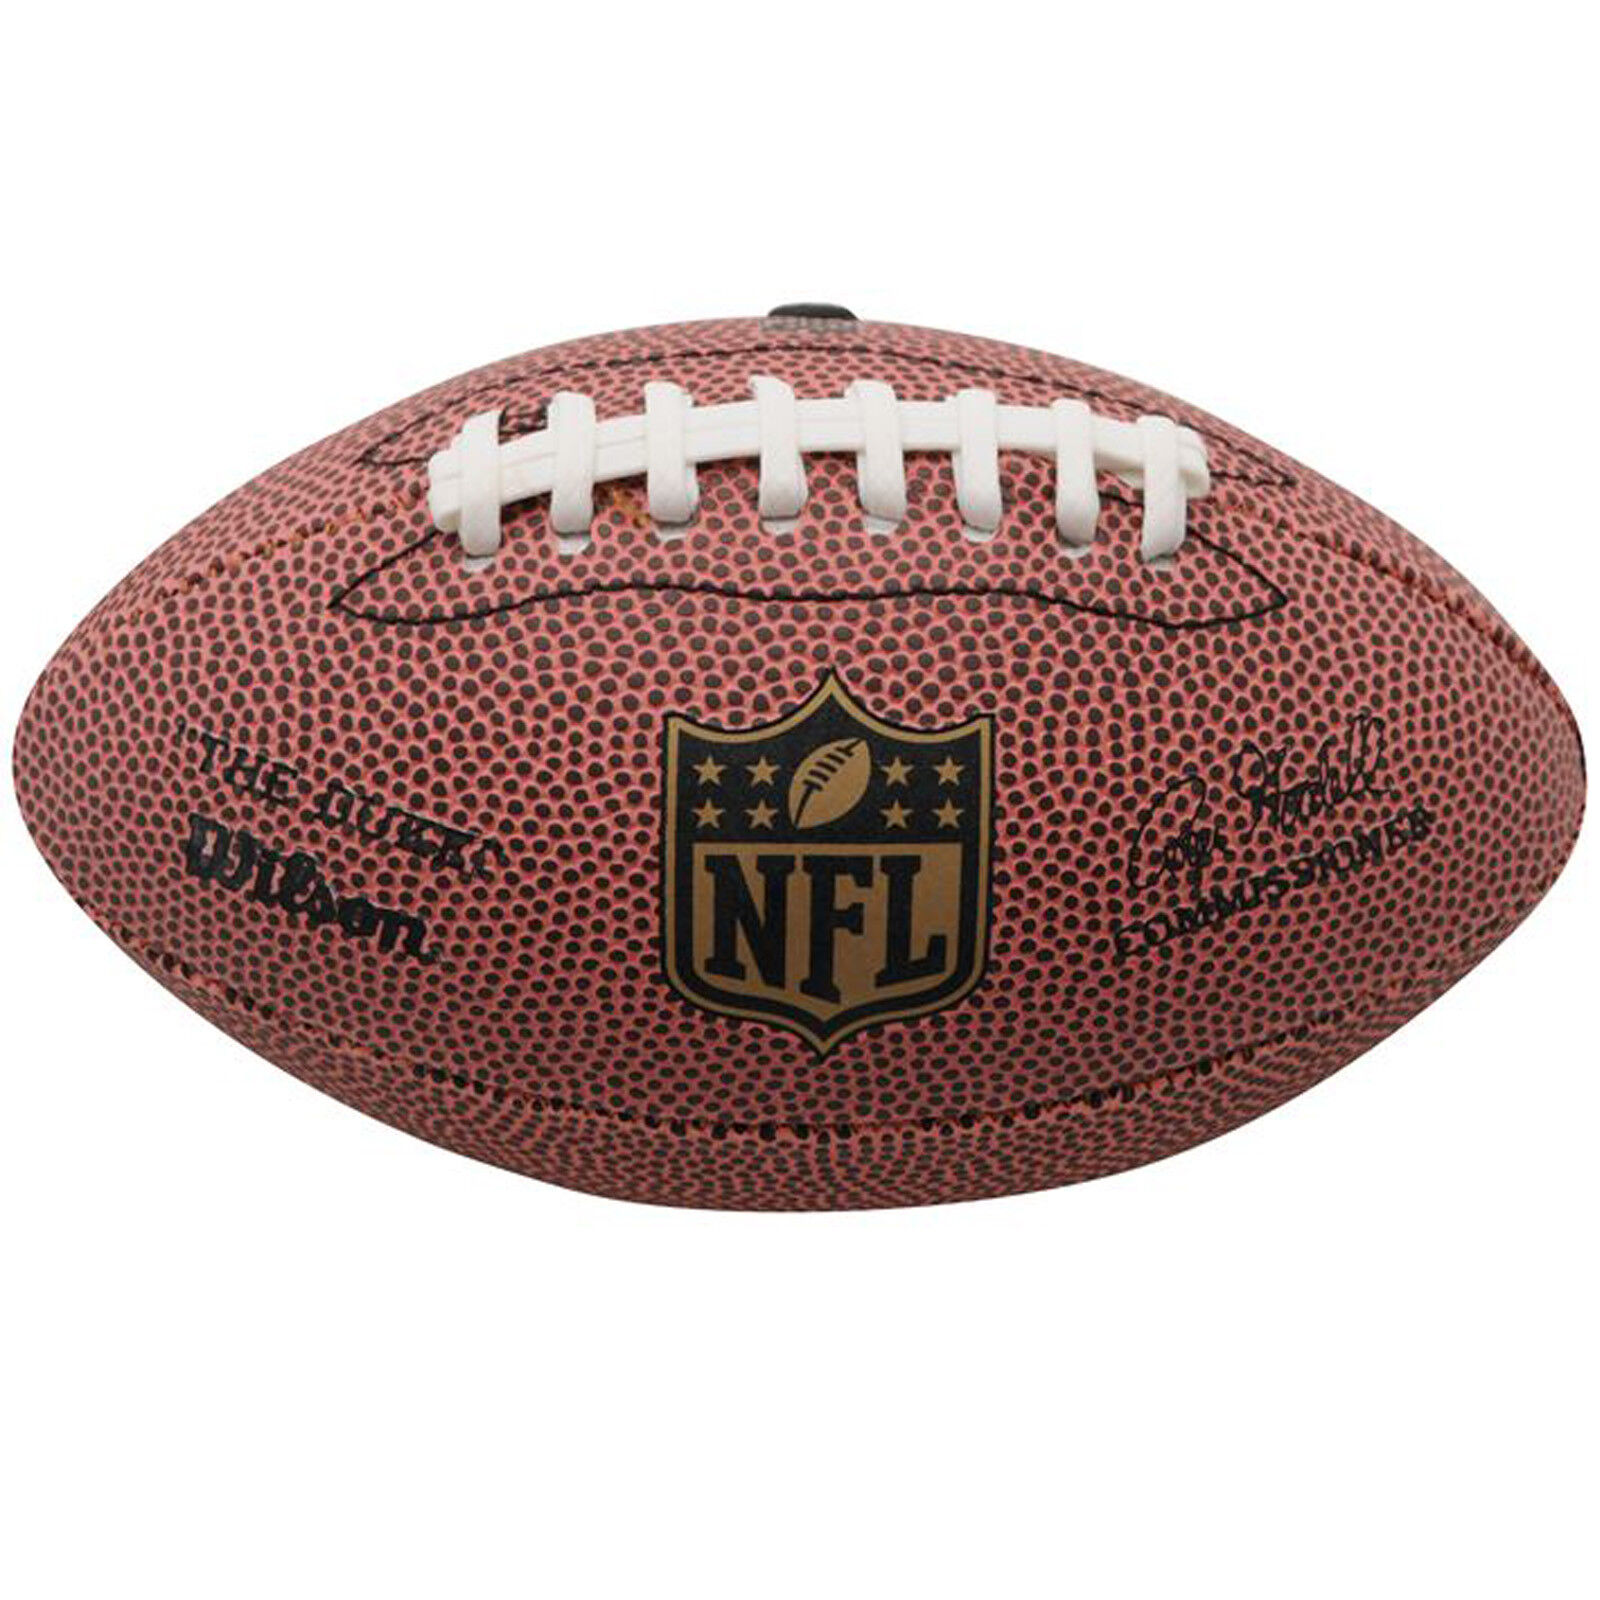 WILSON NFL Mini American Football The Duke Ball Super Bowl Soft Grip